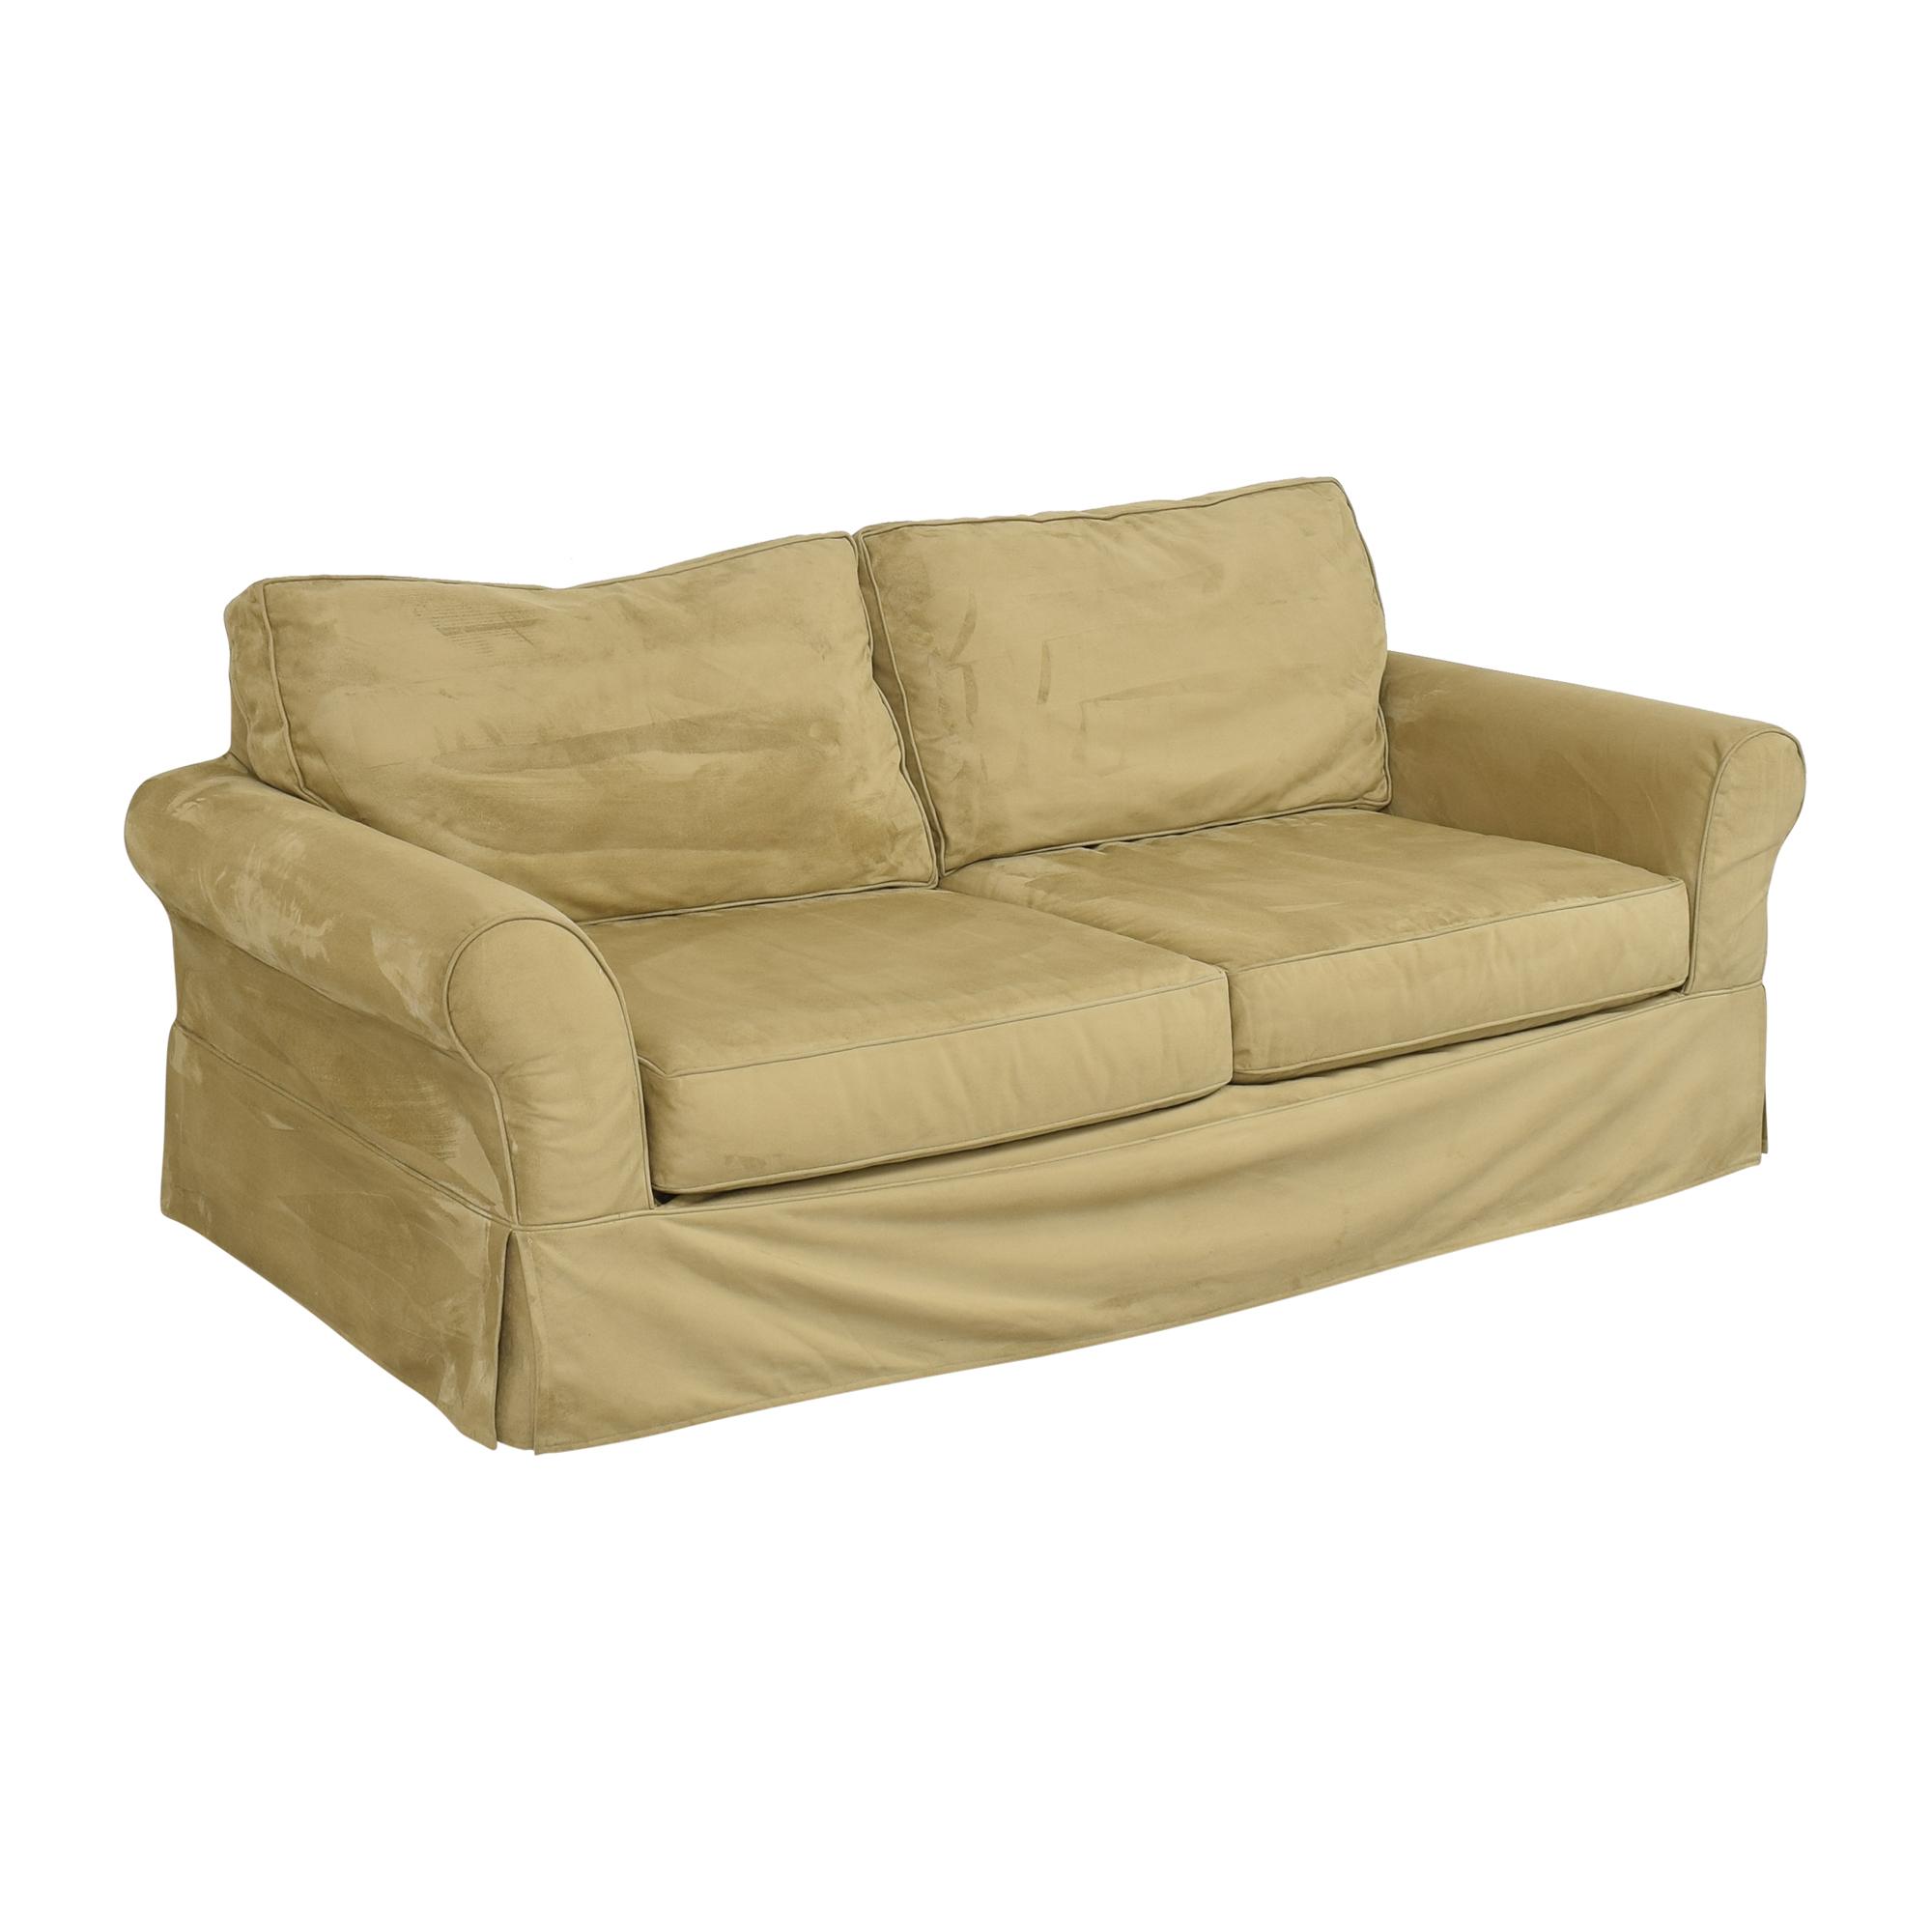 Pottery Barn Pottery Barn Comfort Roll Arm Slipcovered Sofa discount